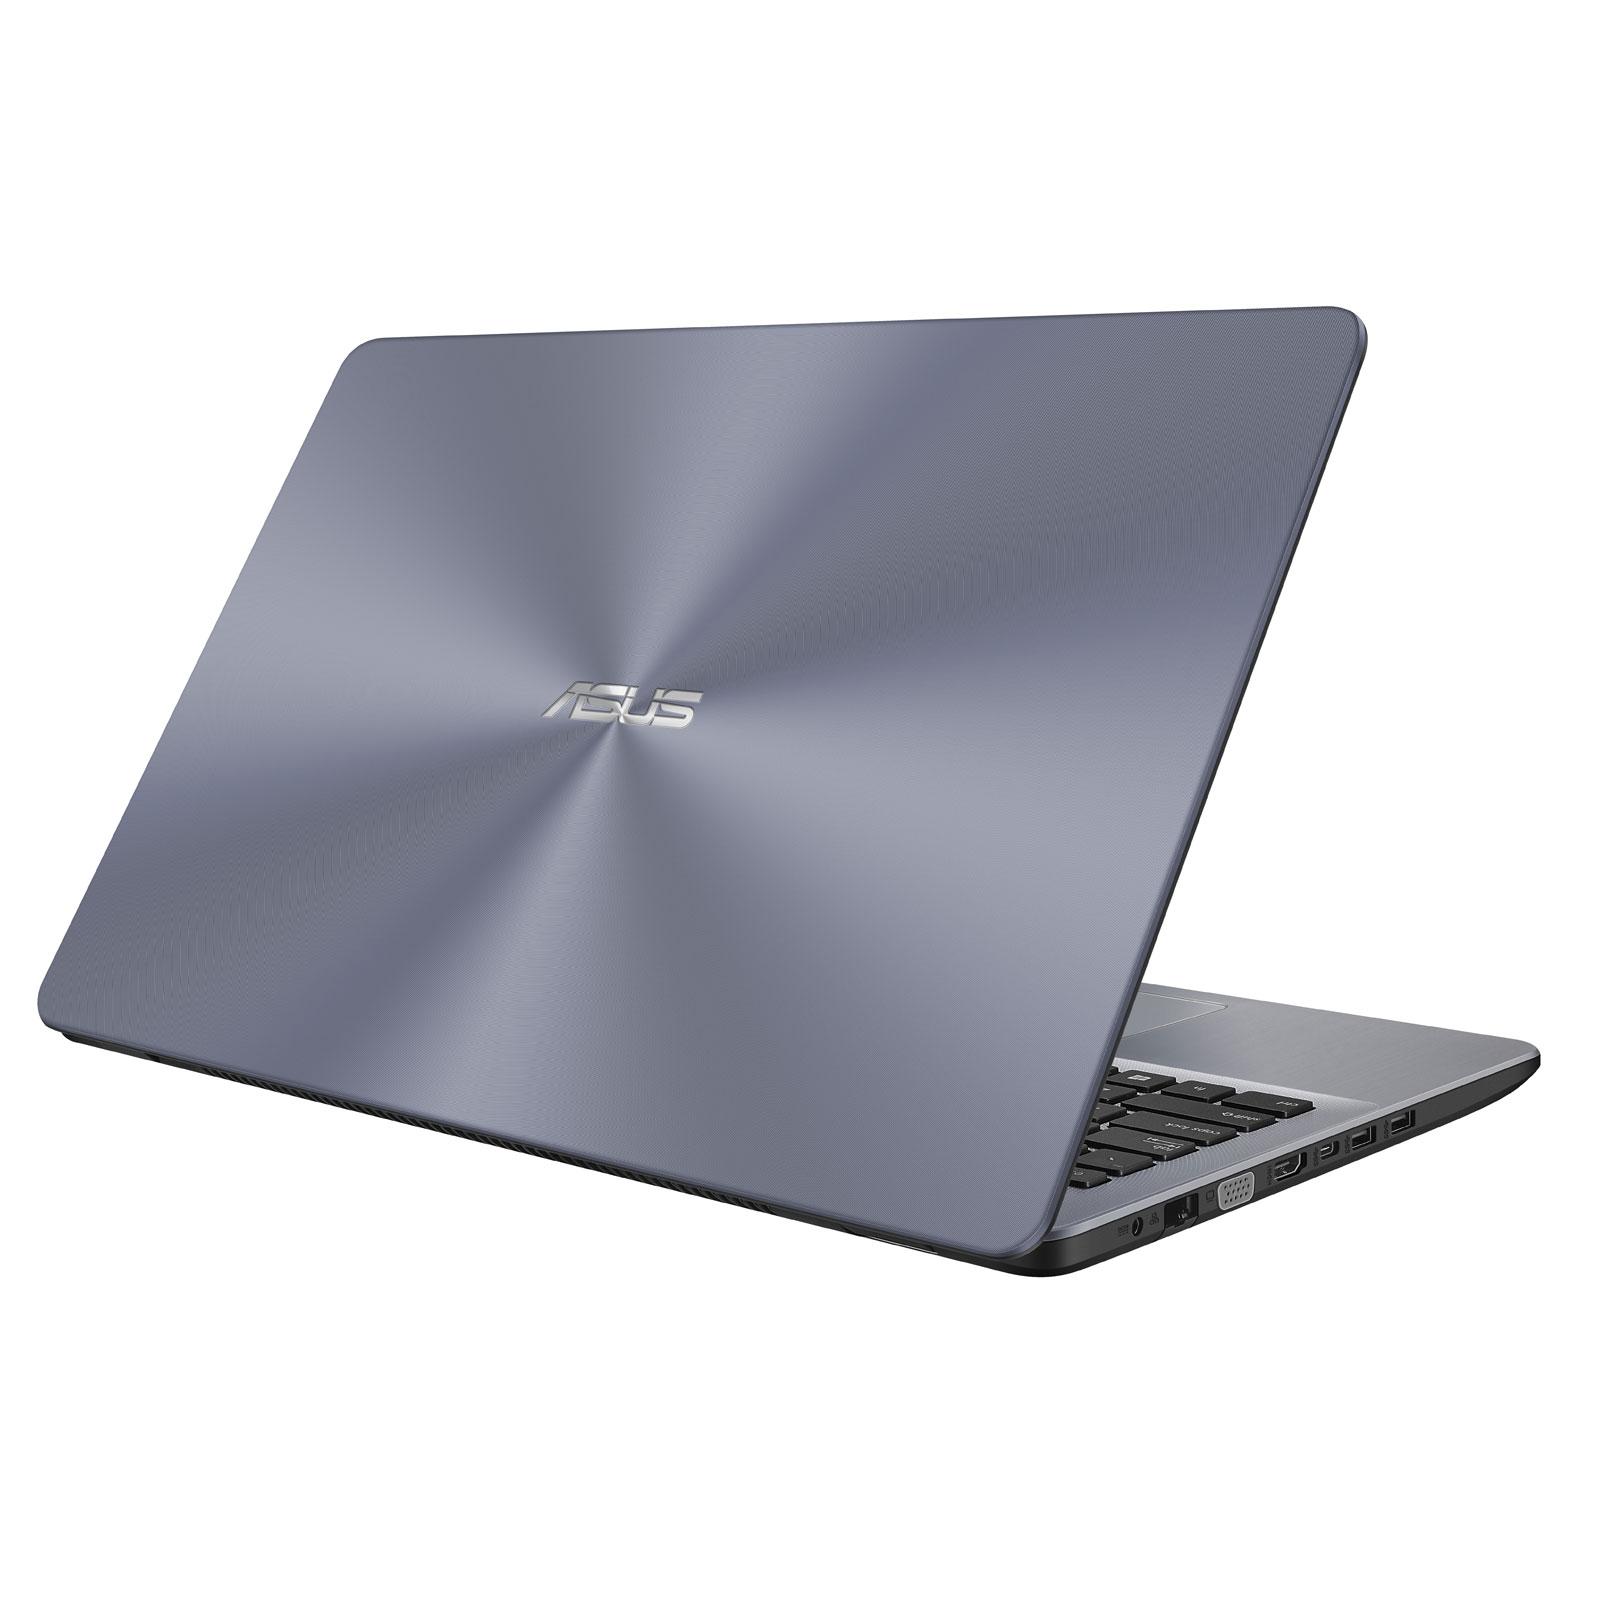 PC portable Asus P1501UA-GQ599R (90NB0F22-M08110) - Achat / Vente PC portable sur Picata.fr - 2